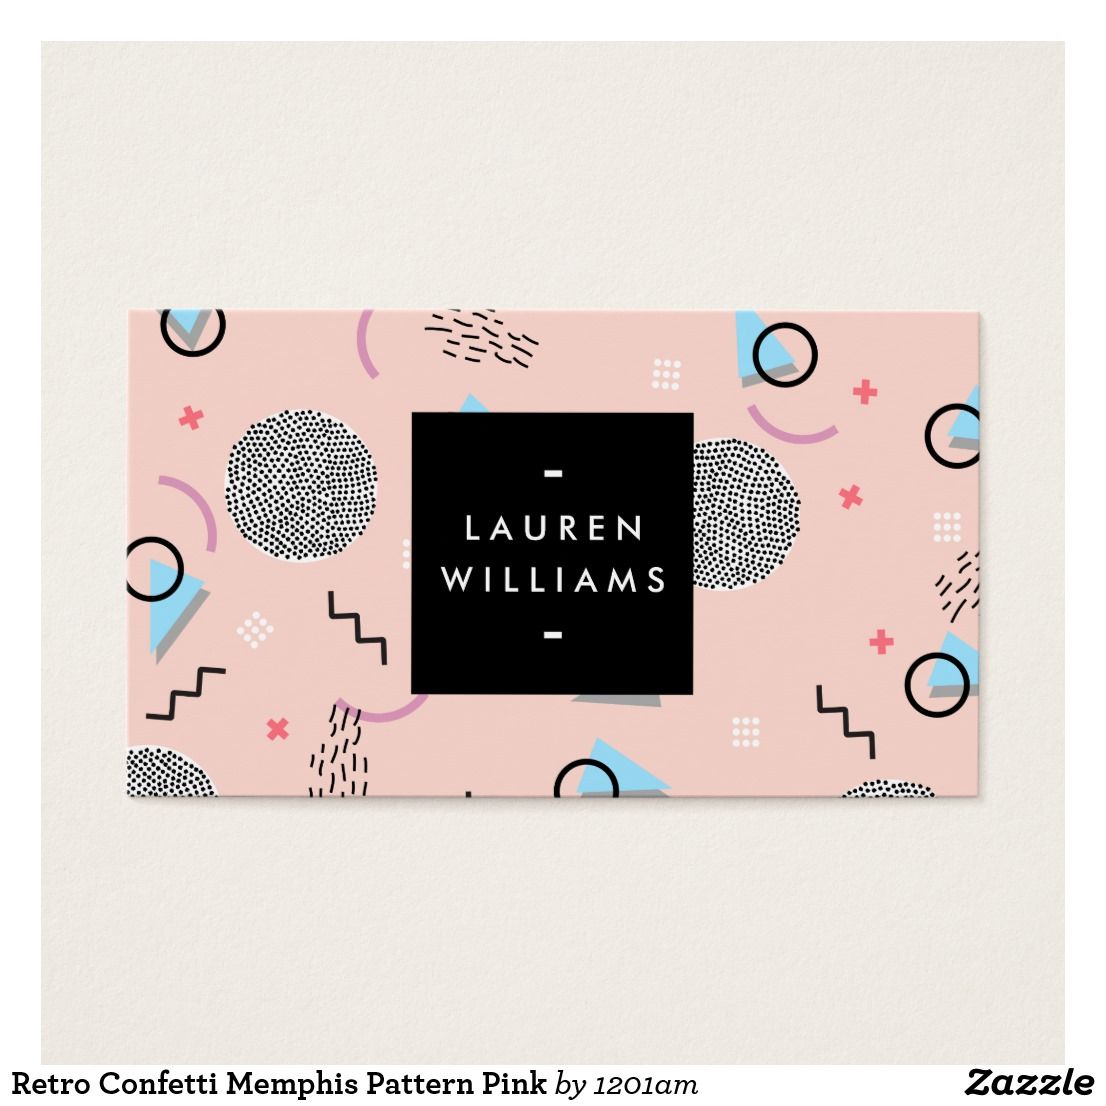 Retro Confetti Memphis Pattern Pink Business Card | Pinterest ...